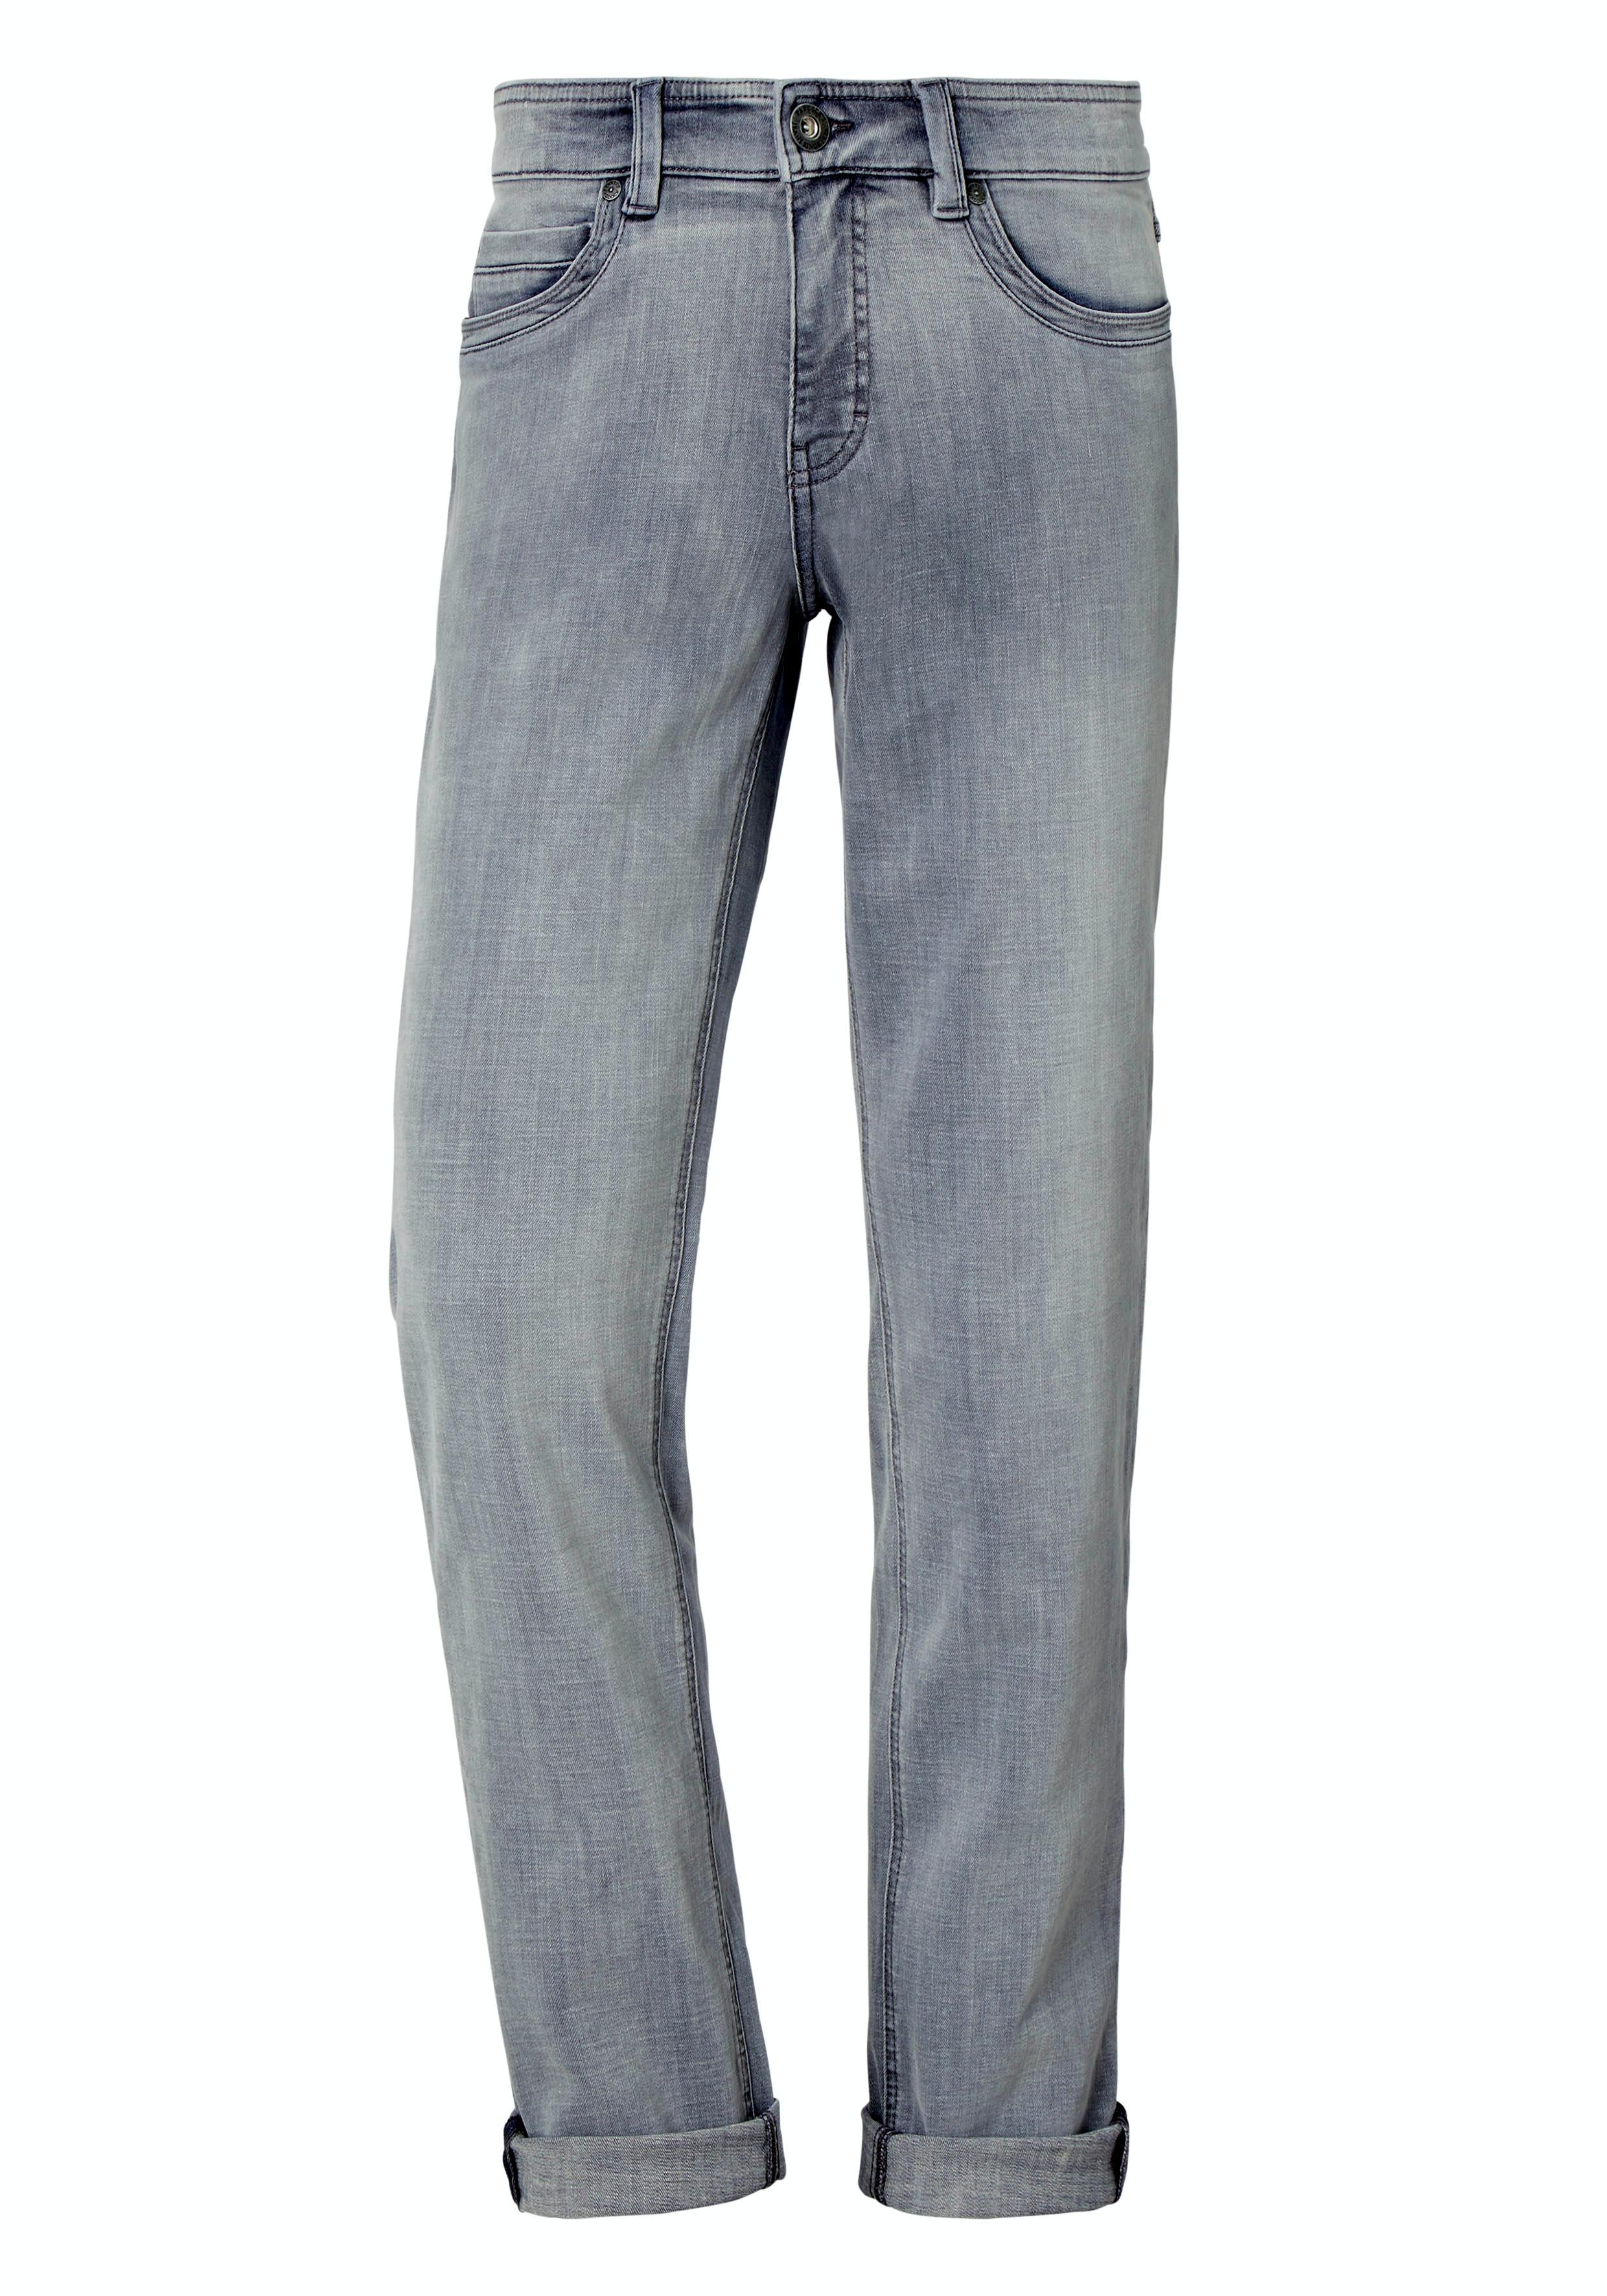 Paddock's Jeans  Ranger  Pipe extra lang grey